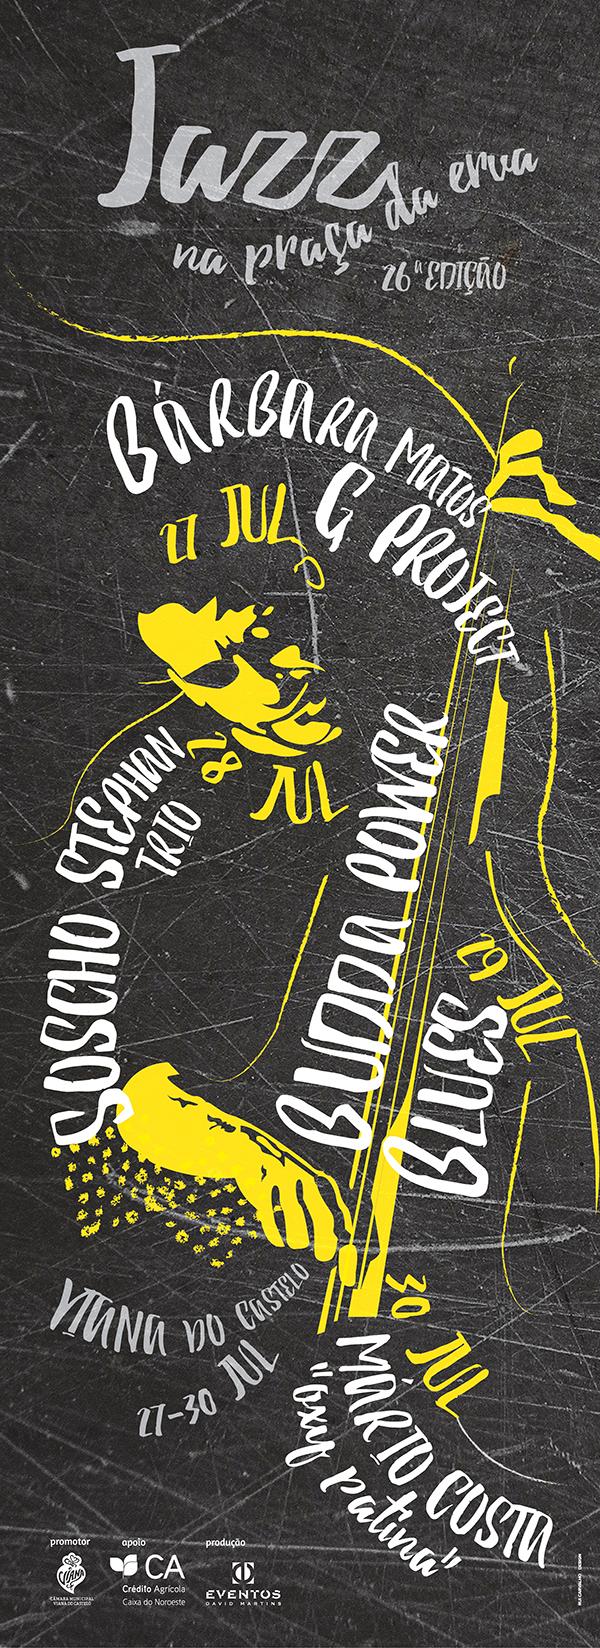 jazz poster viana do castelo Portugal